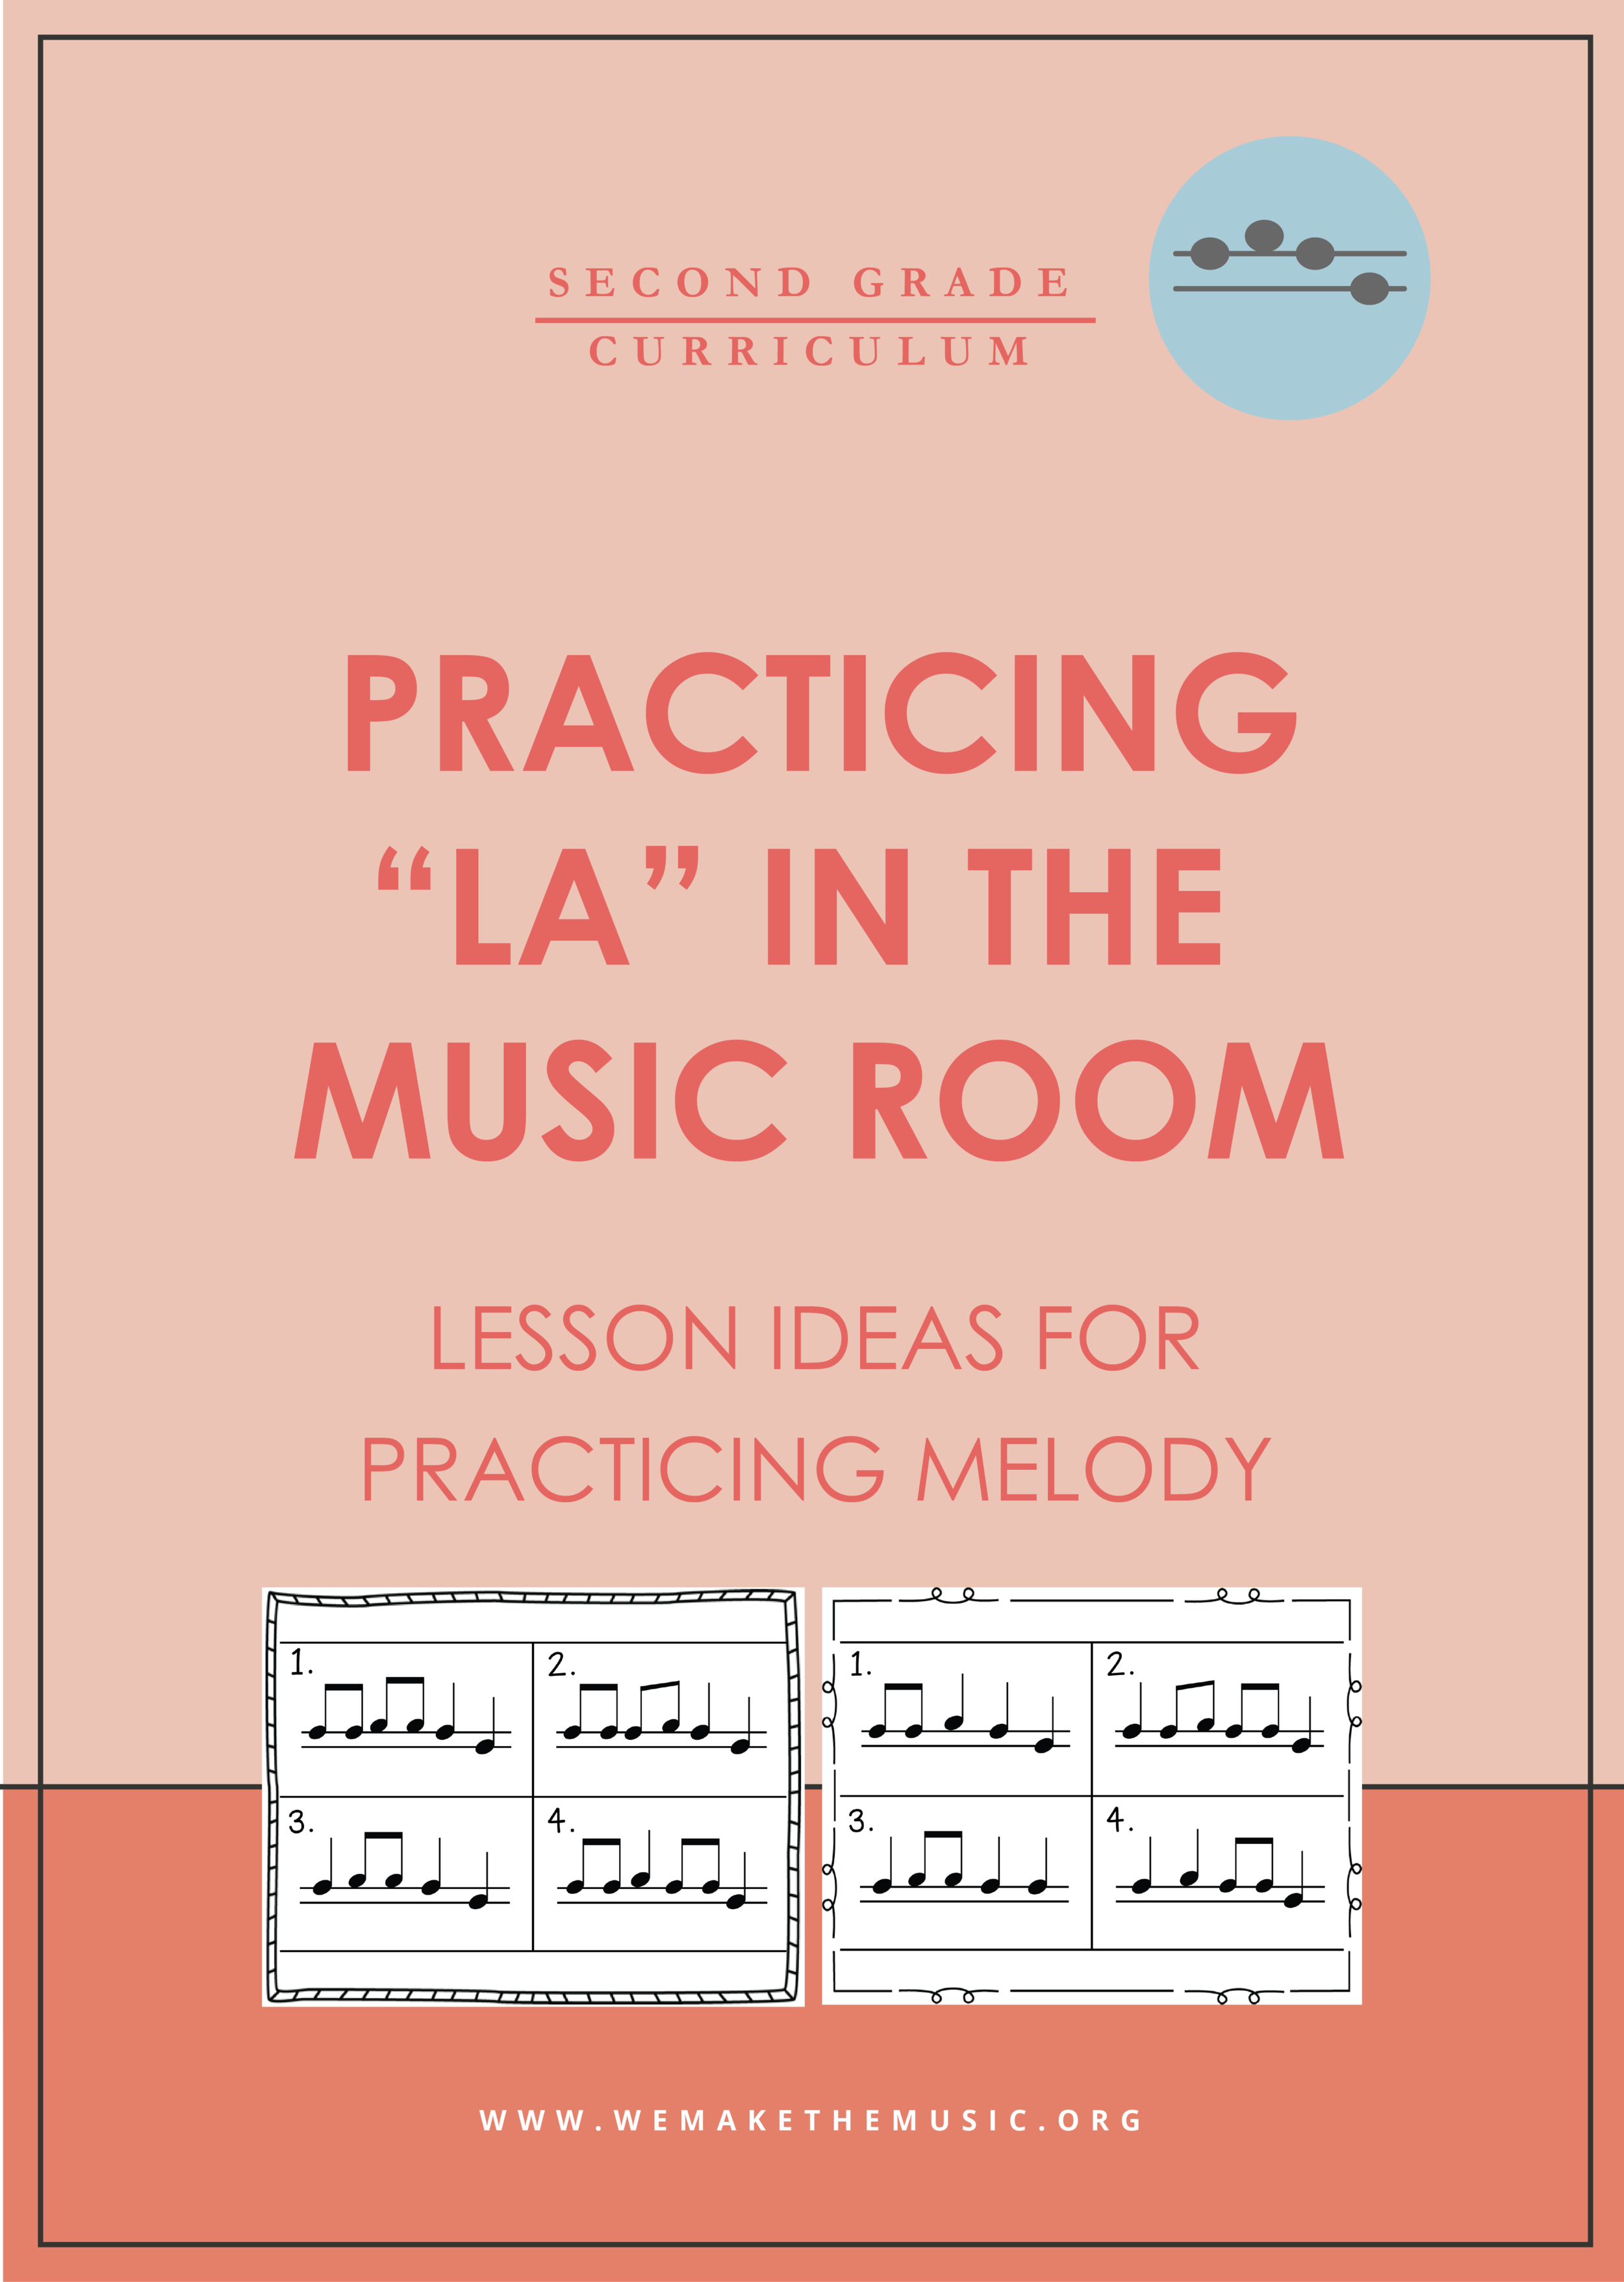 Music Lesson Ideas for La